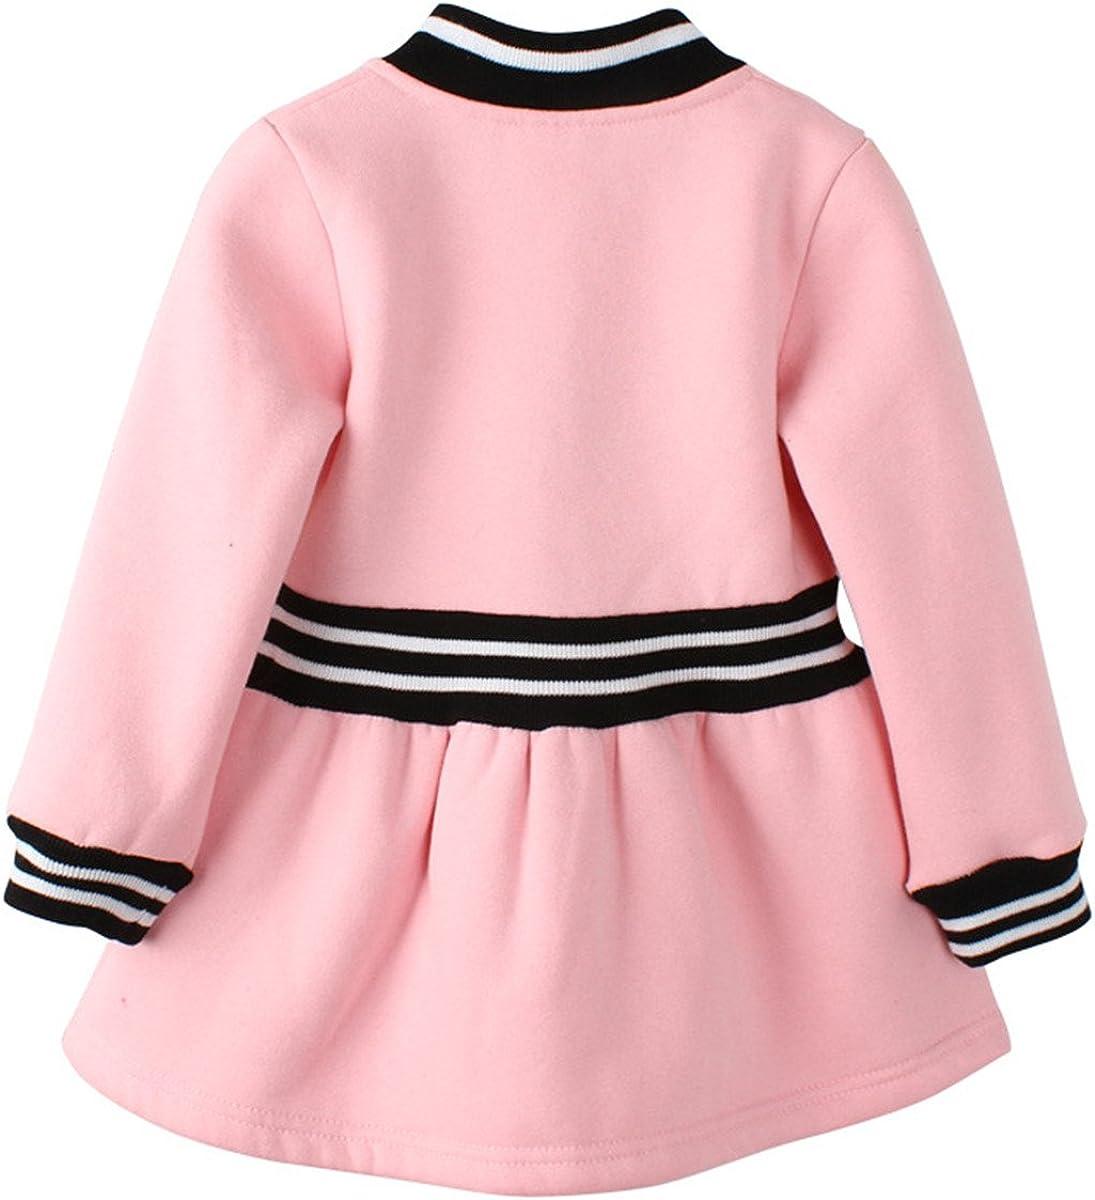 Yanzi6 Baby Girls Long Sleeve Jacquard Coat Dress